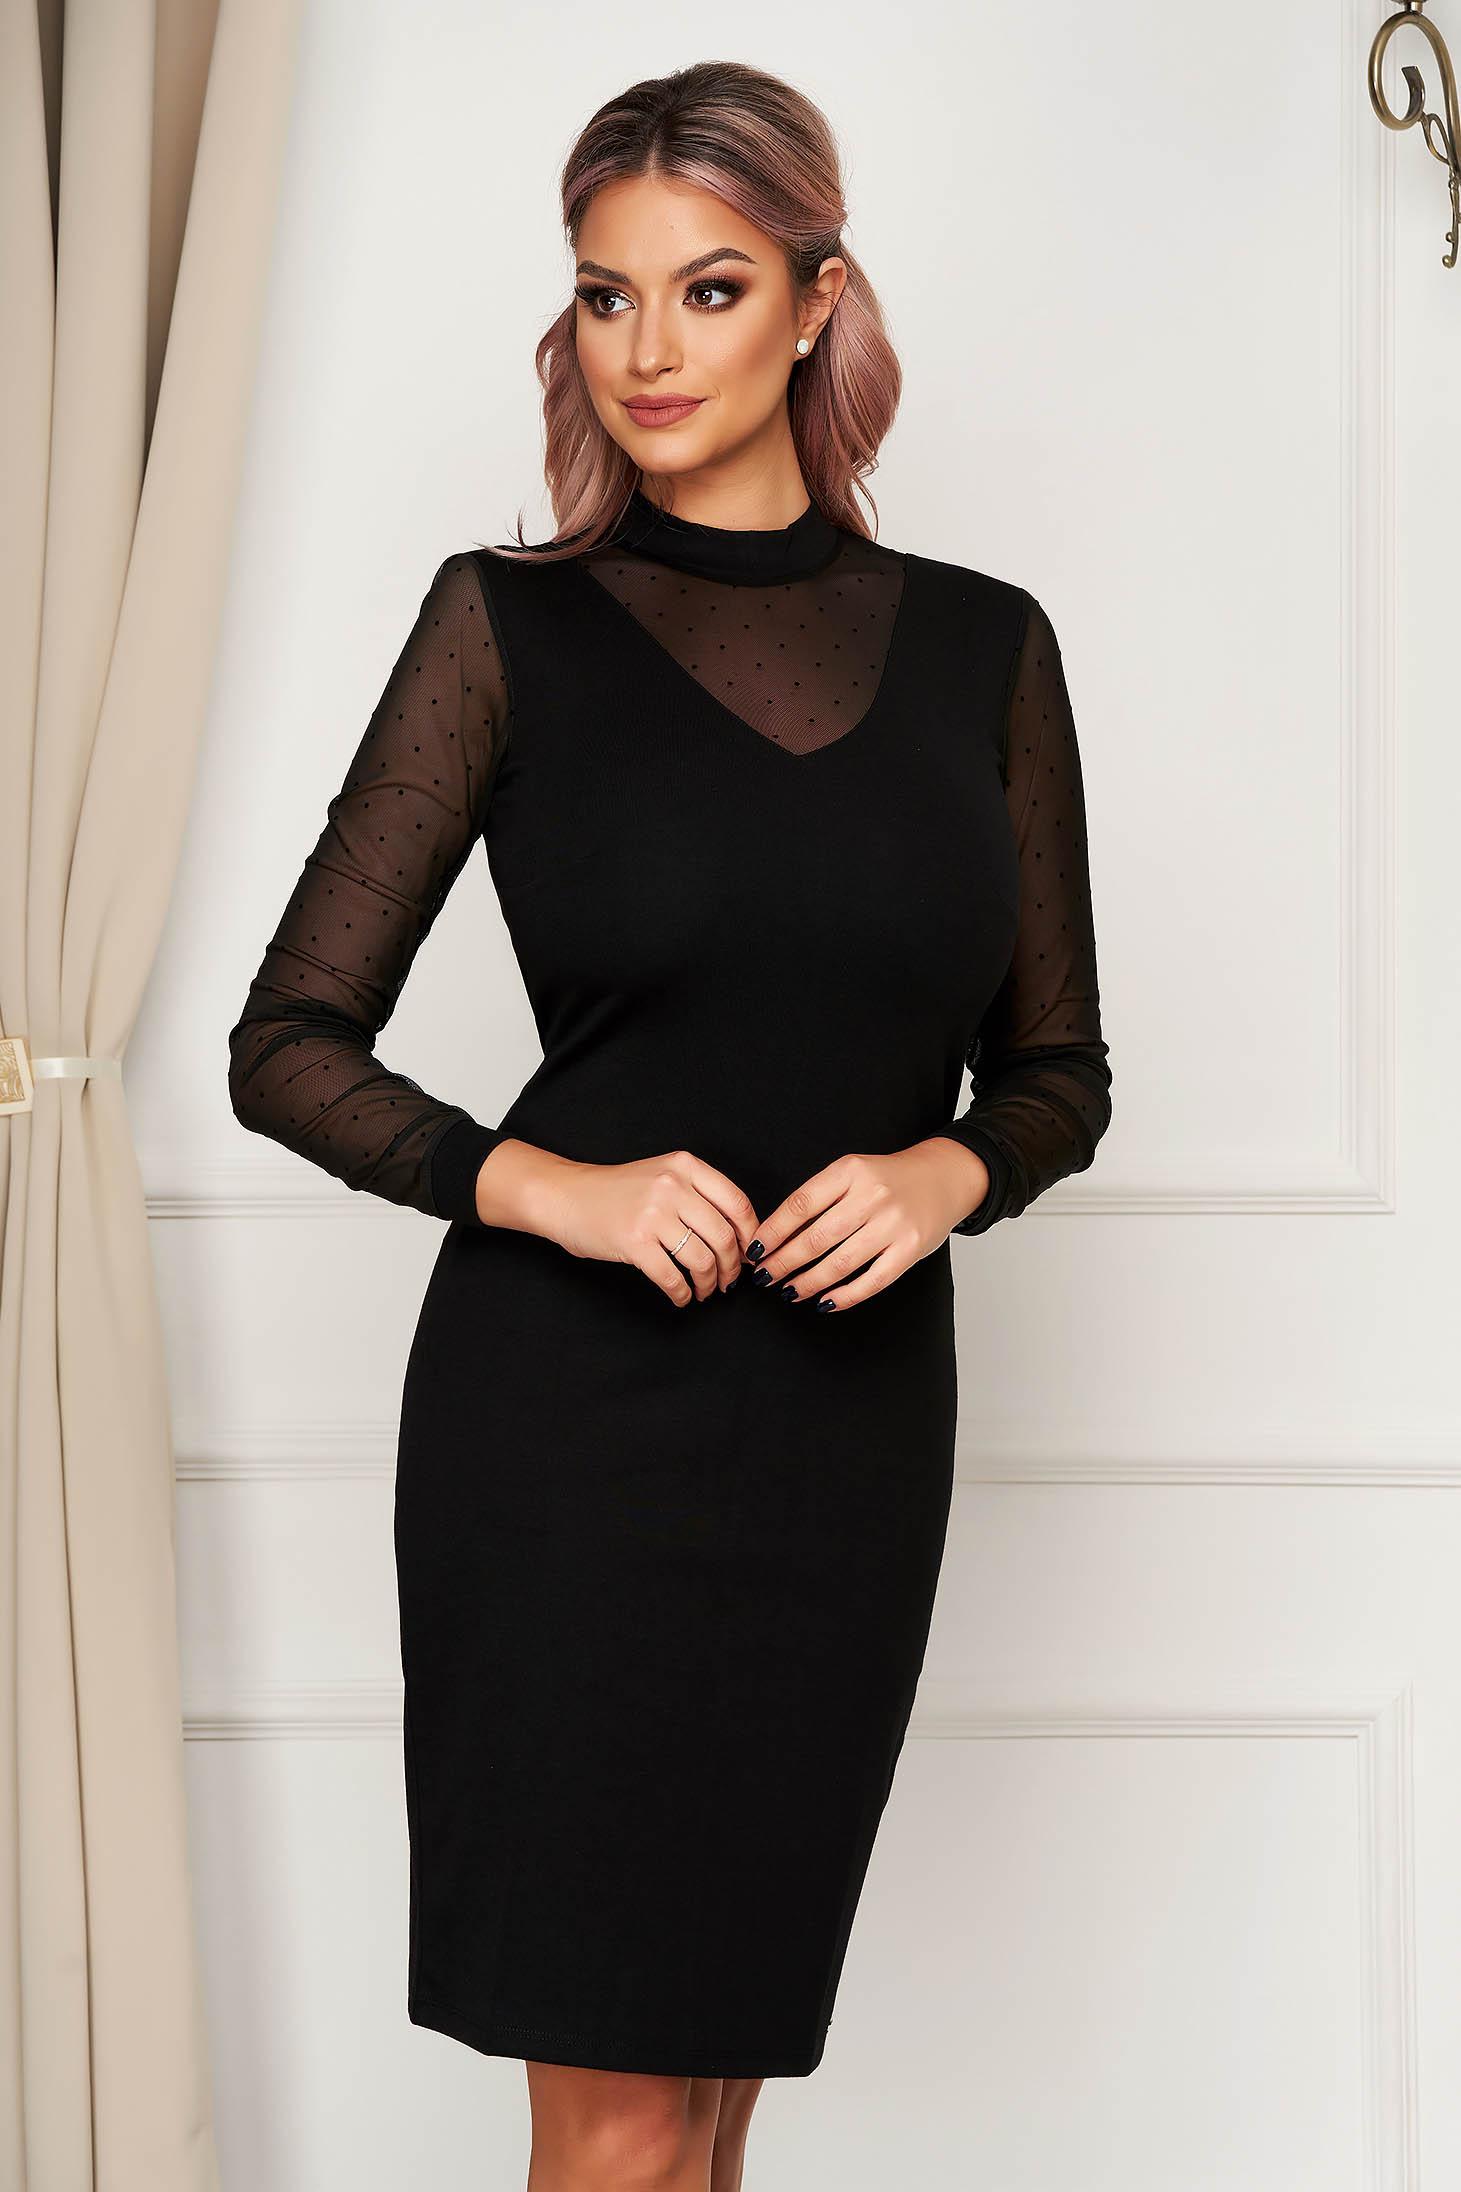 Black dress elegant short cut pencil long sleeved with net accessory